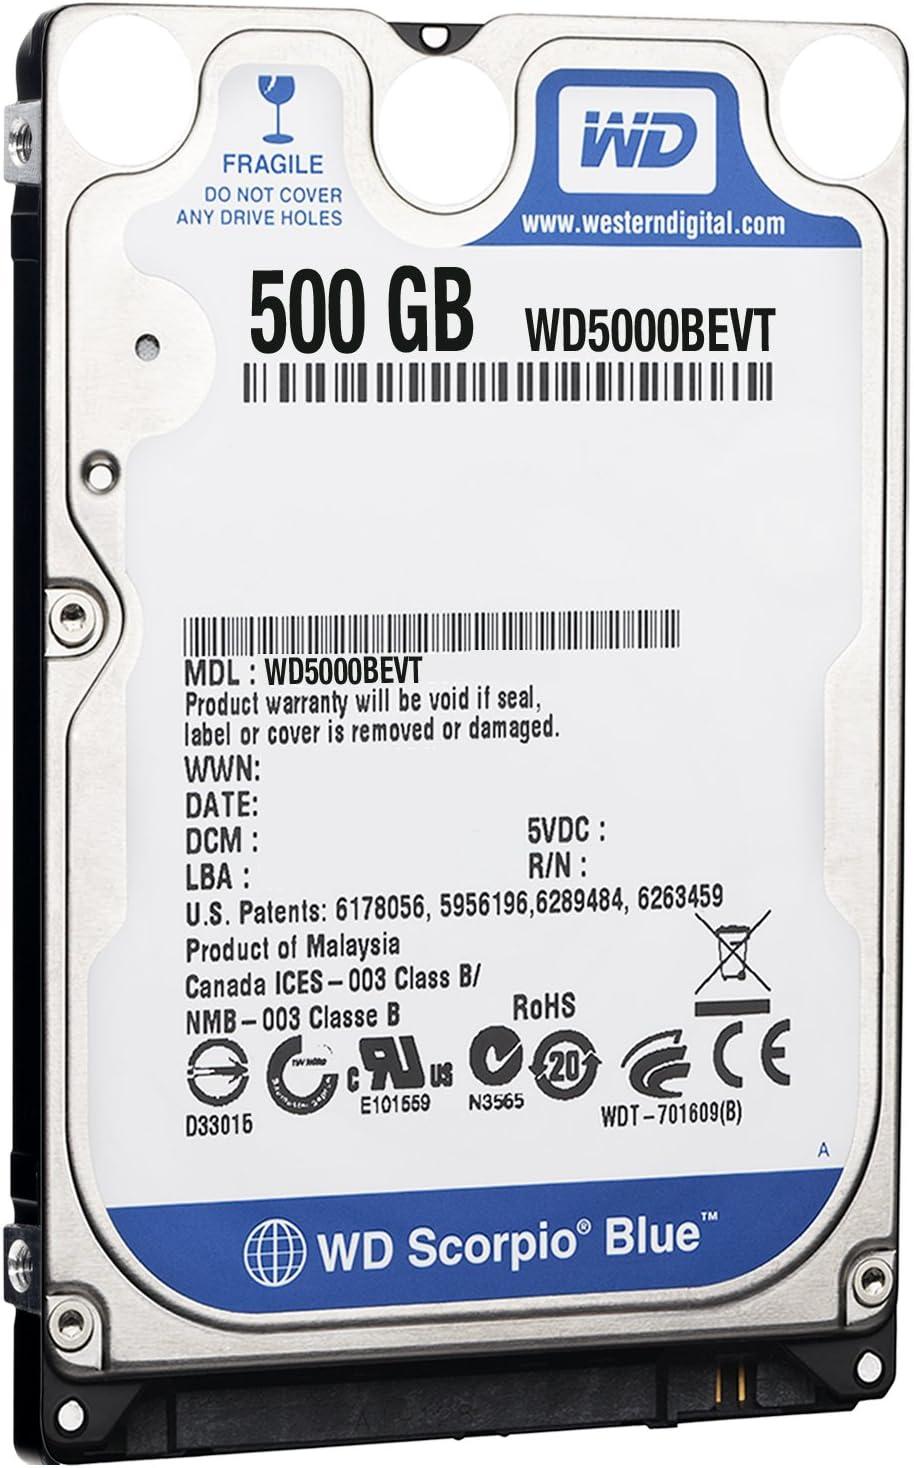 Western Digital 500 GB Scorpio Blue SATA Mobile Internal Hard Drive with 16 MB Cache